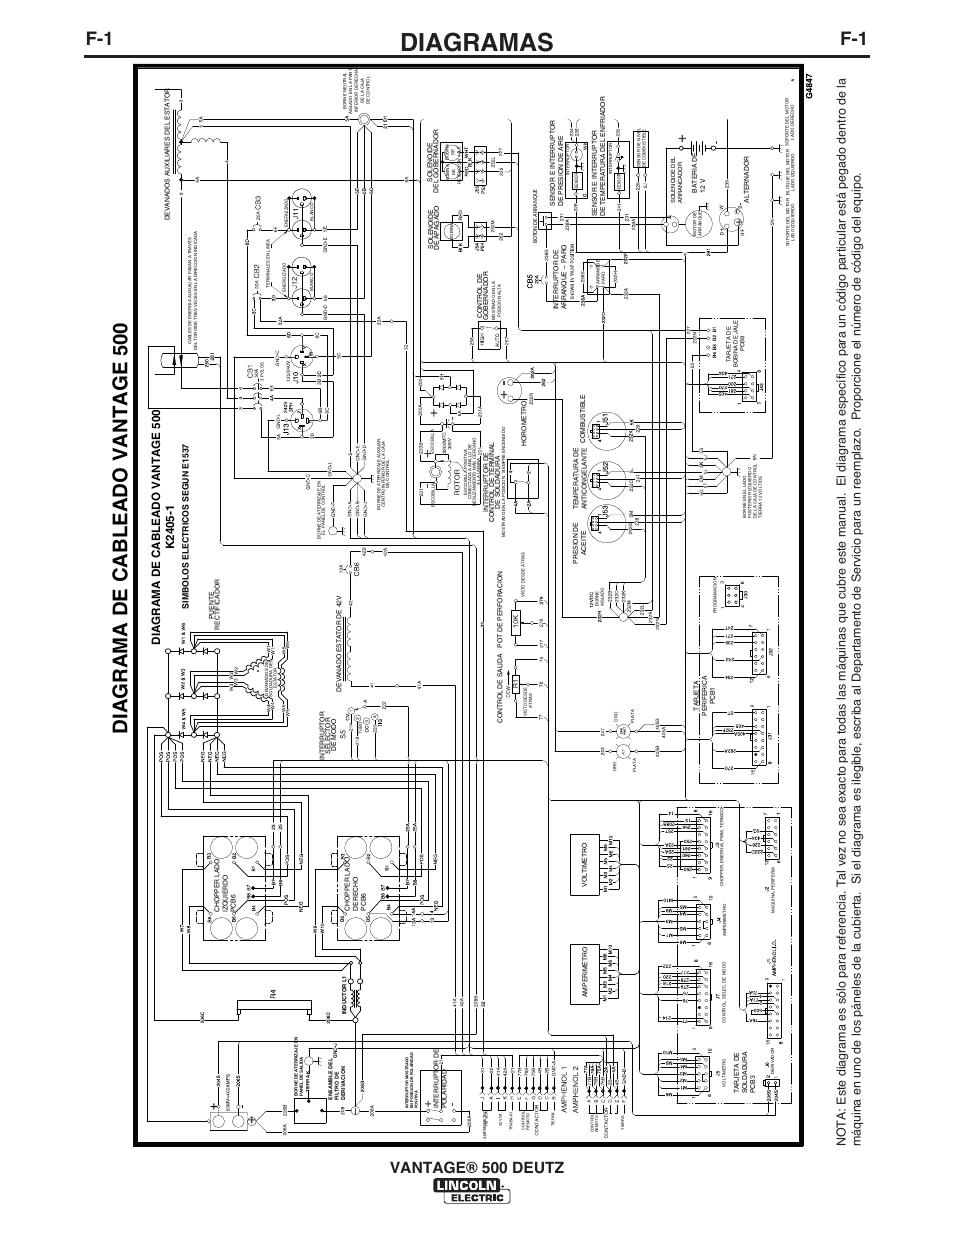 Humbucker Wiring Diagram Further Wiring Diagram On Mekecom